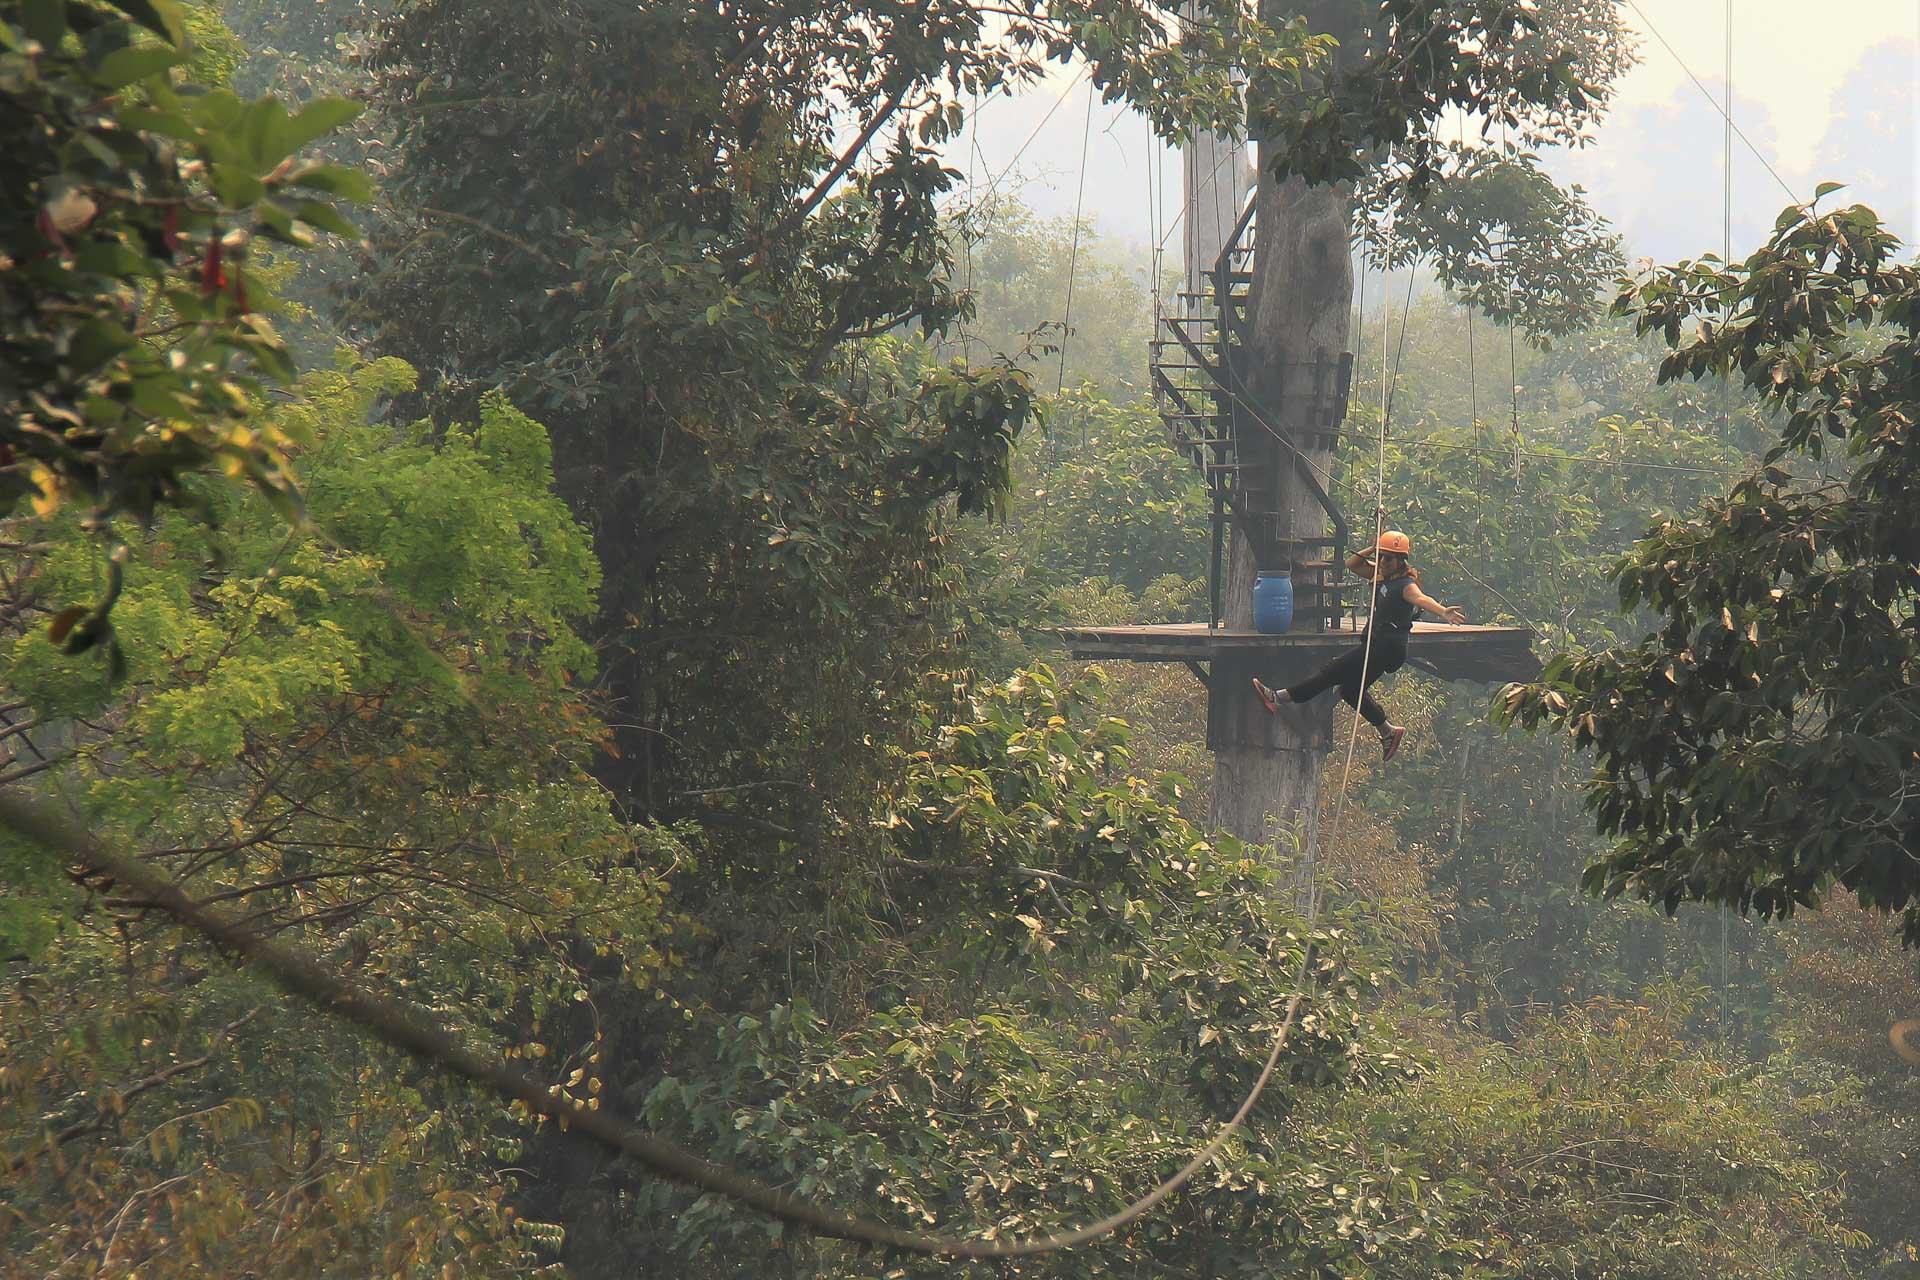 Lesvoyageuses-teste-par-les-voyageuses-tyrolienne-siem-reap-cambodge-angkor-zipline-8